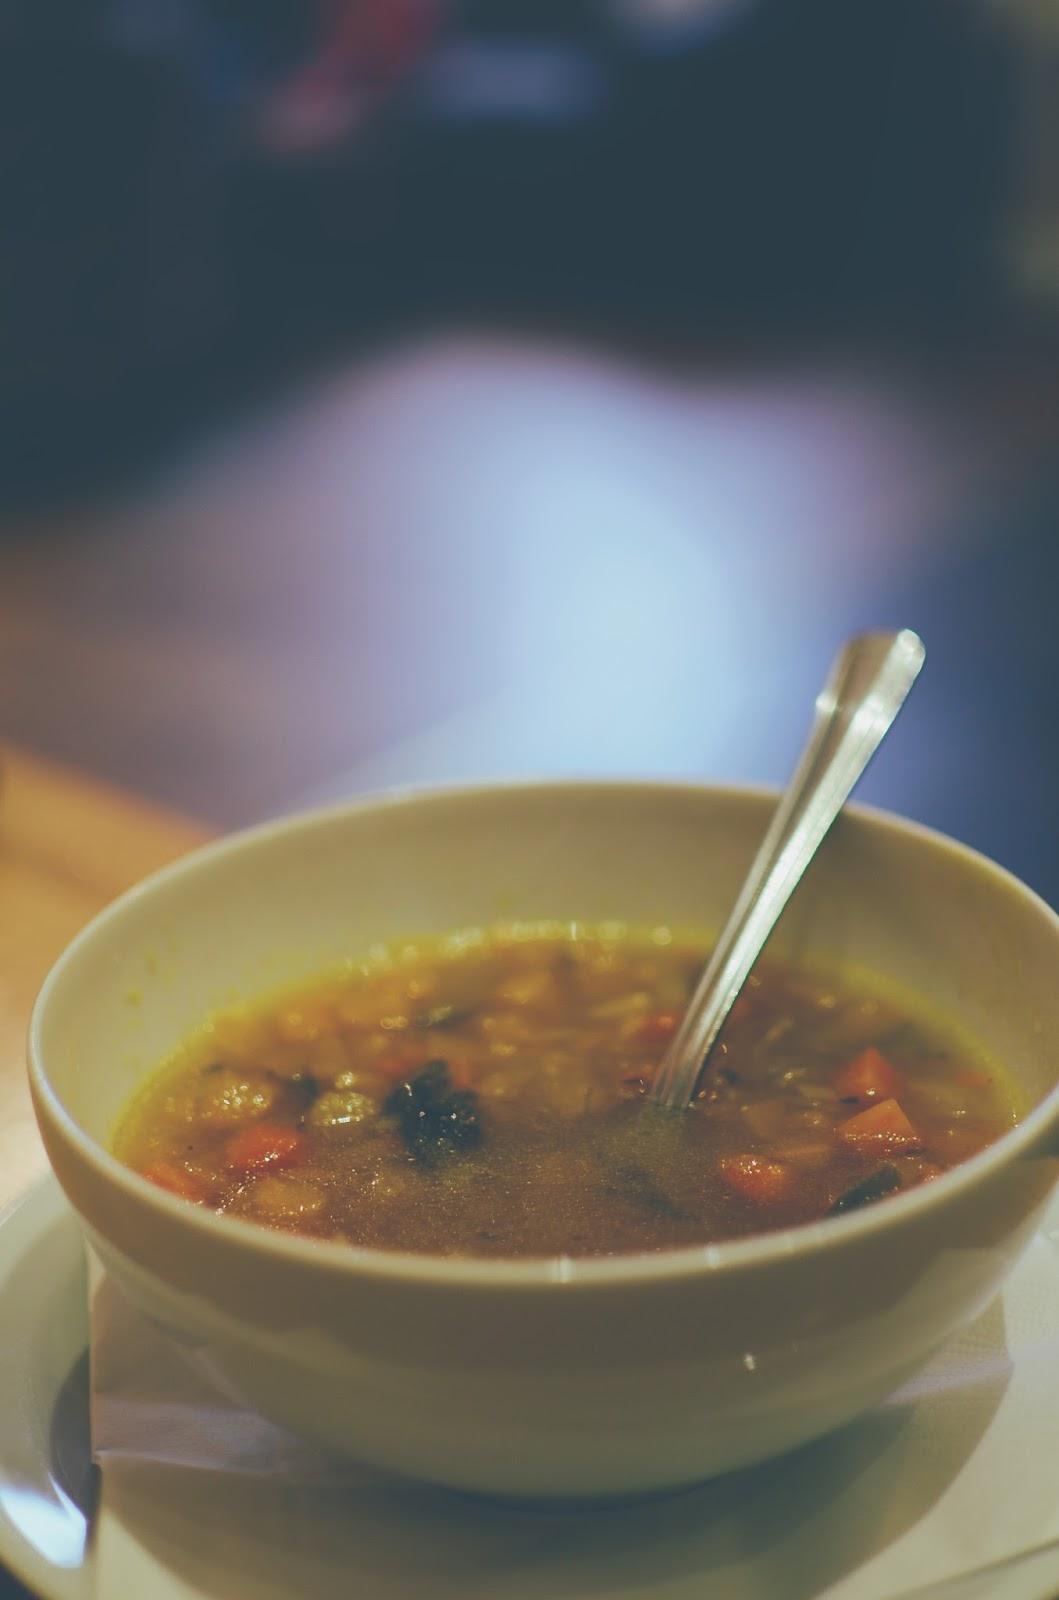 homemade soup, bernies soup, bridge of weir, scottish village, bernies cafe deli, scottish cafe, scottish countryside, scottish brunch, scotland, scottish food, scottish restaurant, scottish food, local food, scottish deli, deli, bridge of weir deli, bridge of weir cafe,